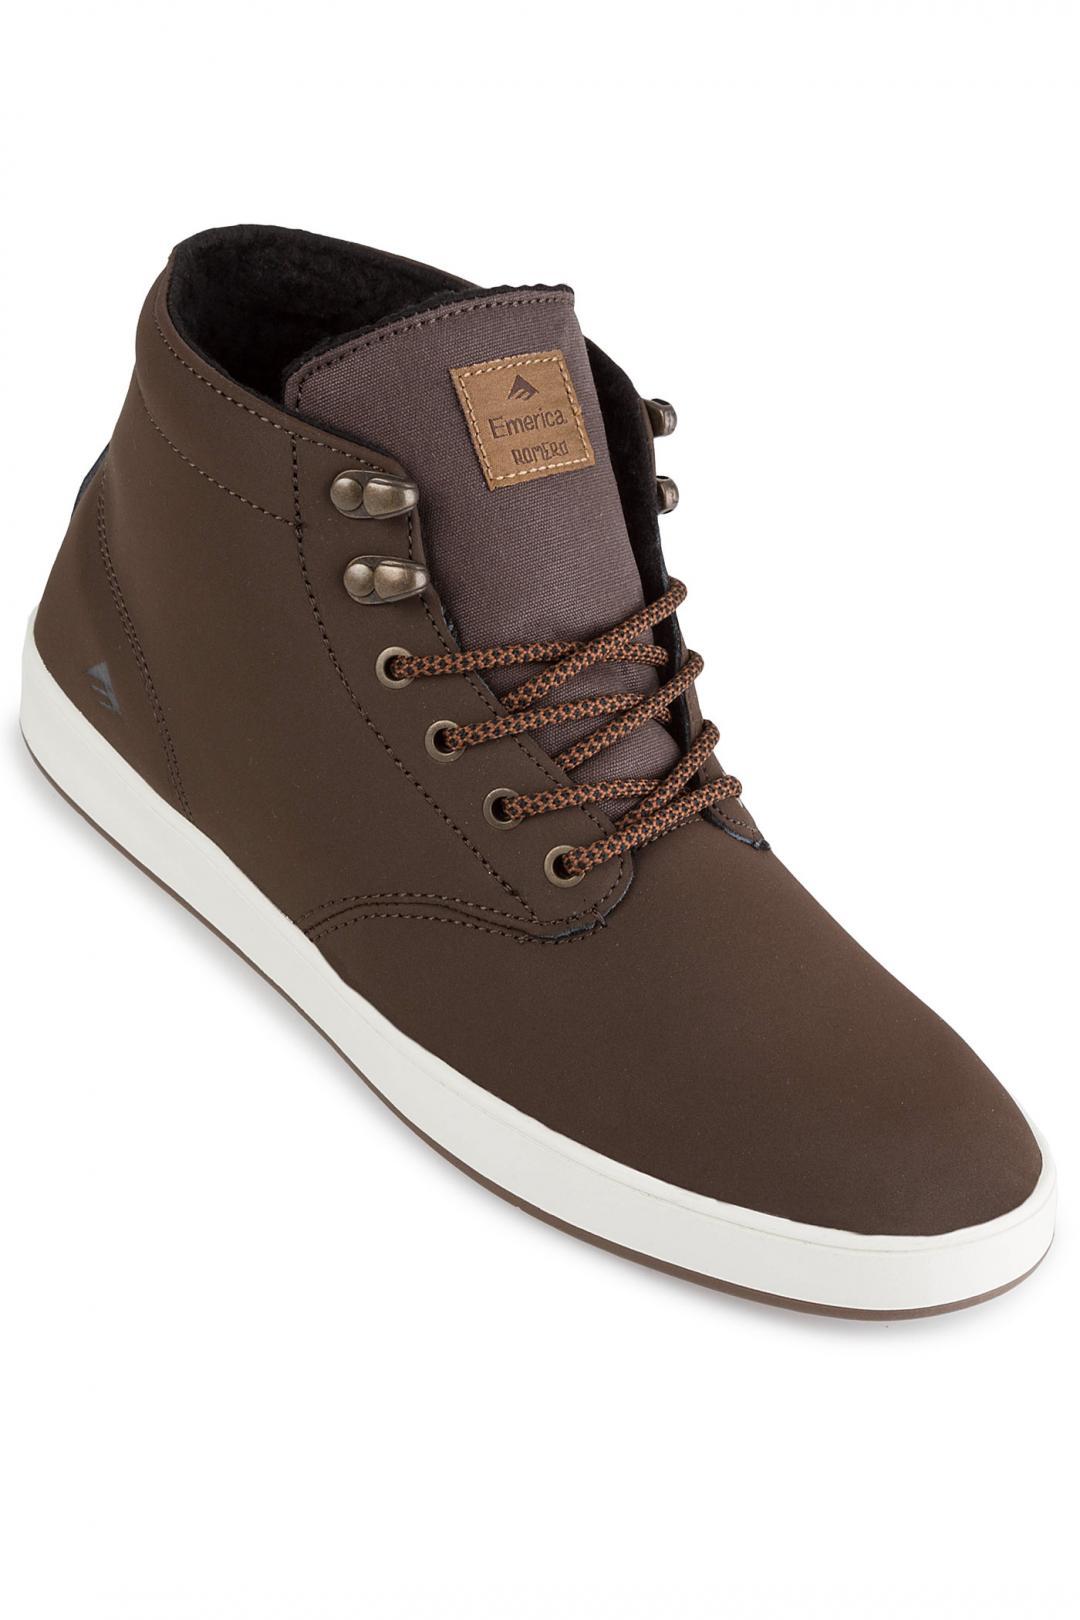 Uomo Emerica Romero Laced High weatherized brown | Sneaker